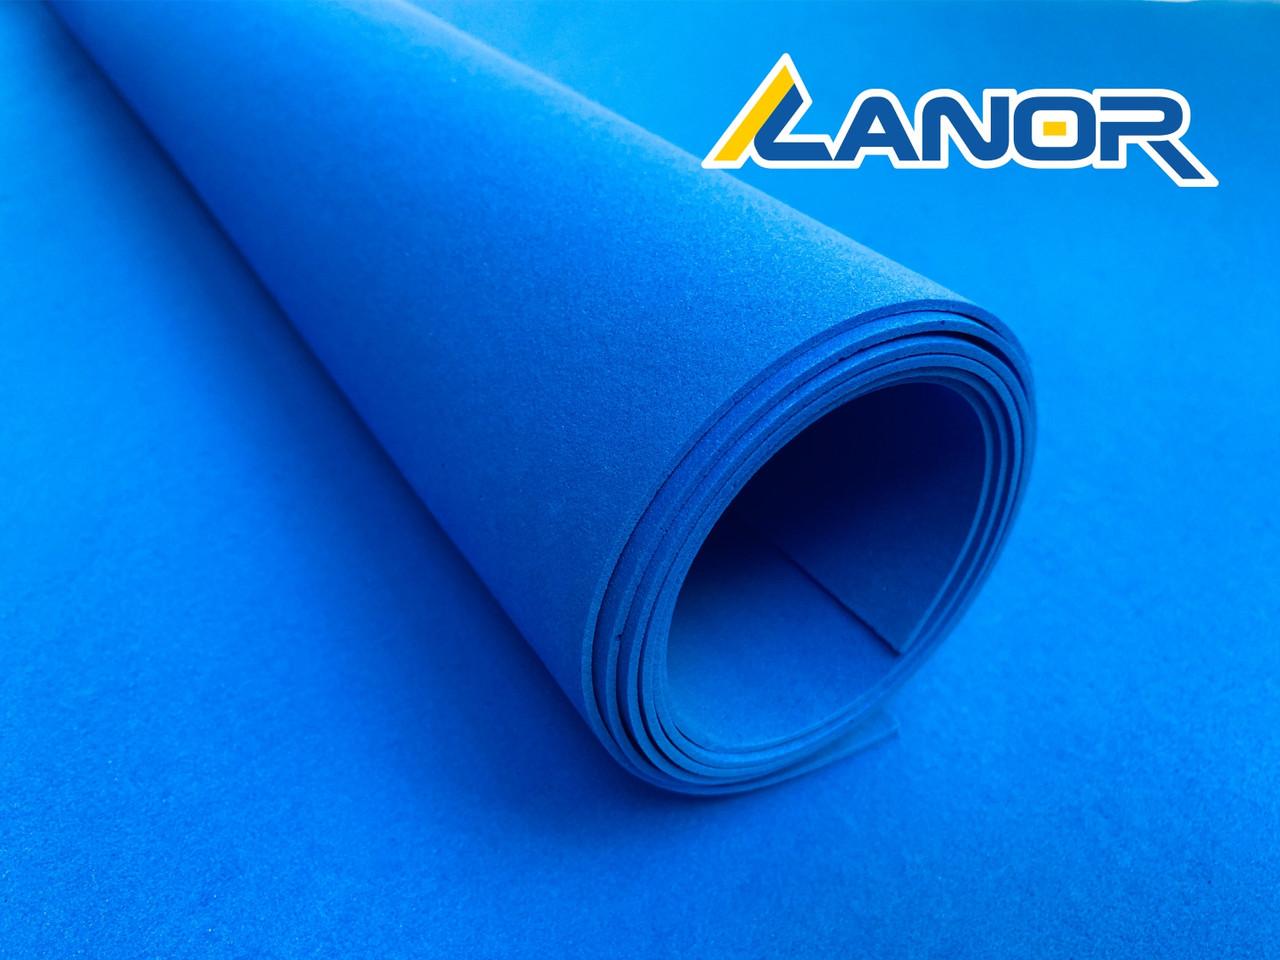 Lanor EVA 0075 лист 100*150см  (3мм) Синий